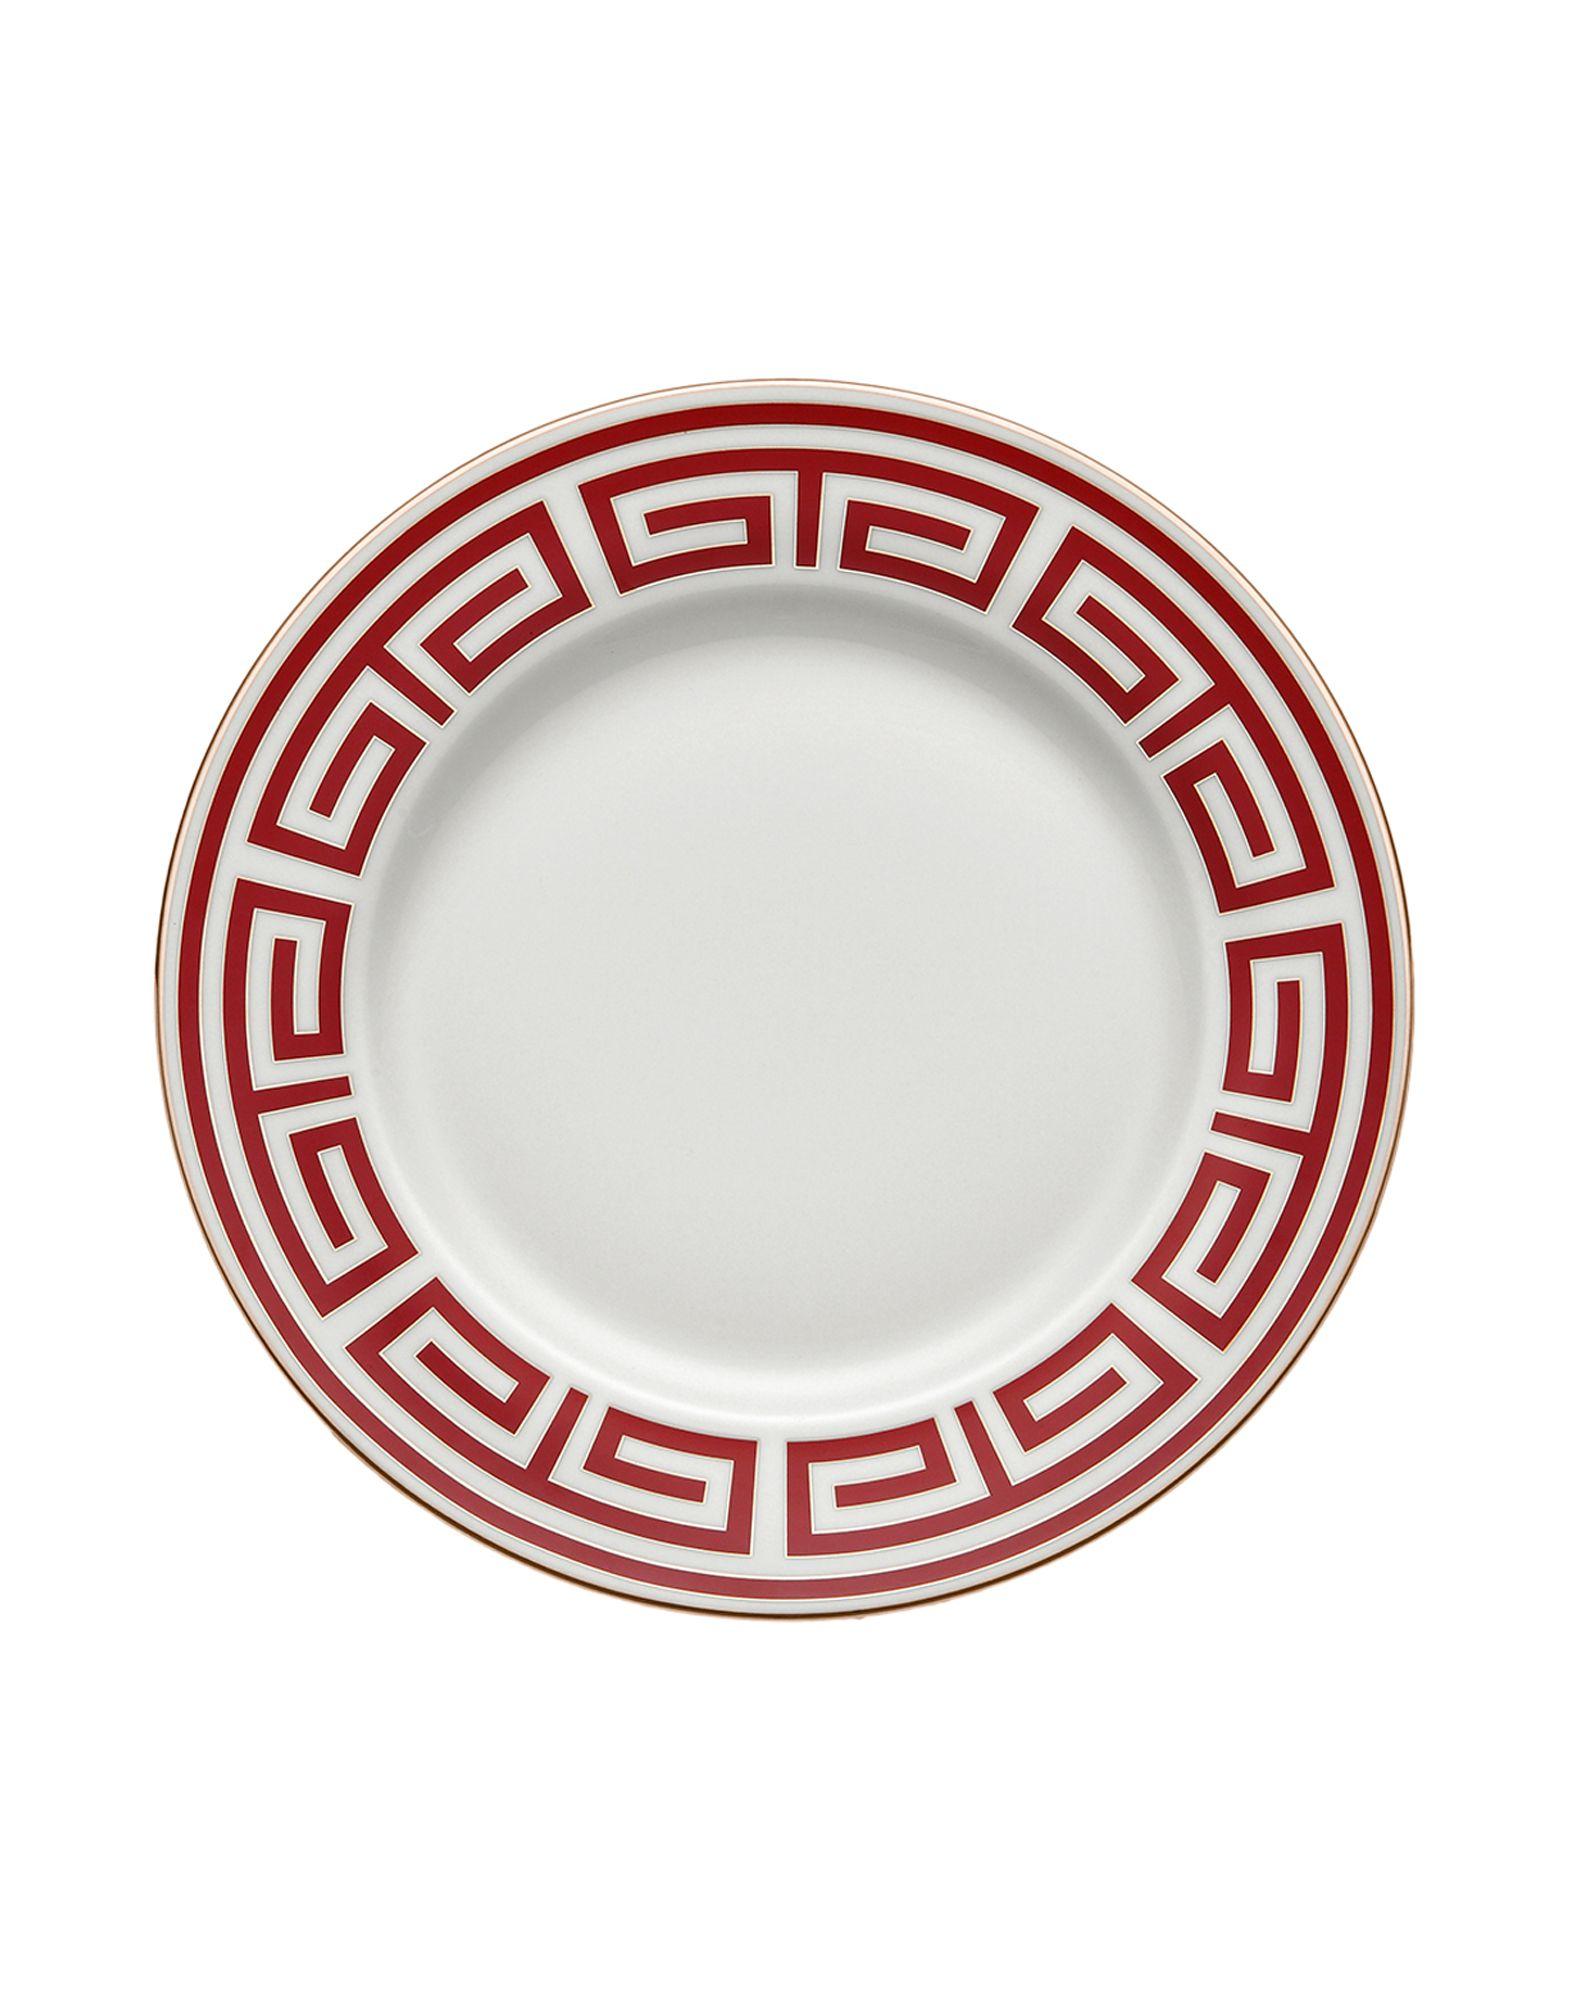 RICHARD GINORI Декоративная тарелка